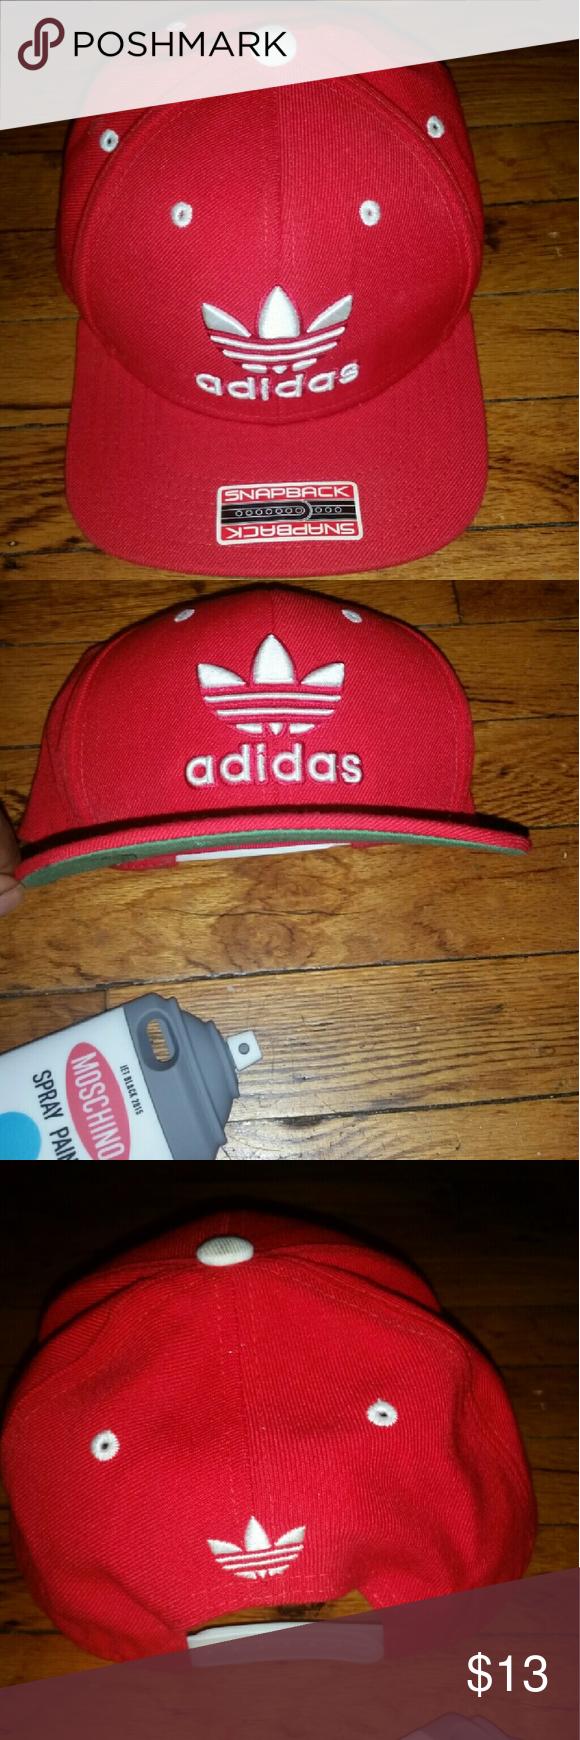 Adidas Snapback Red n White Adidas Snapback adidas Accessories Hats